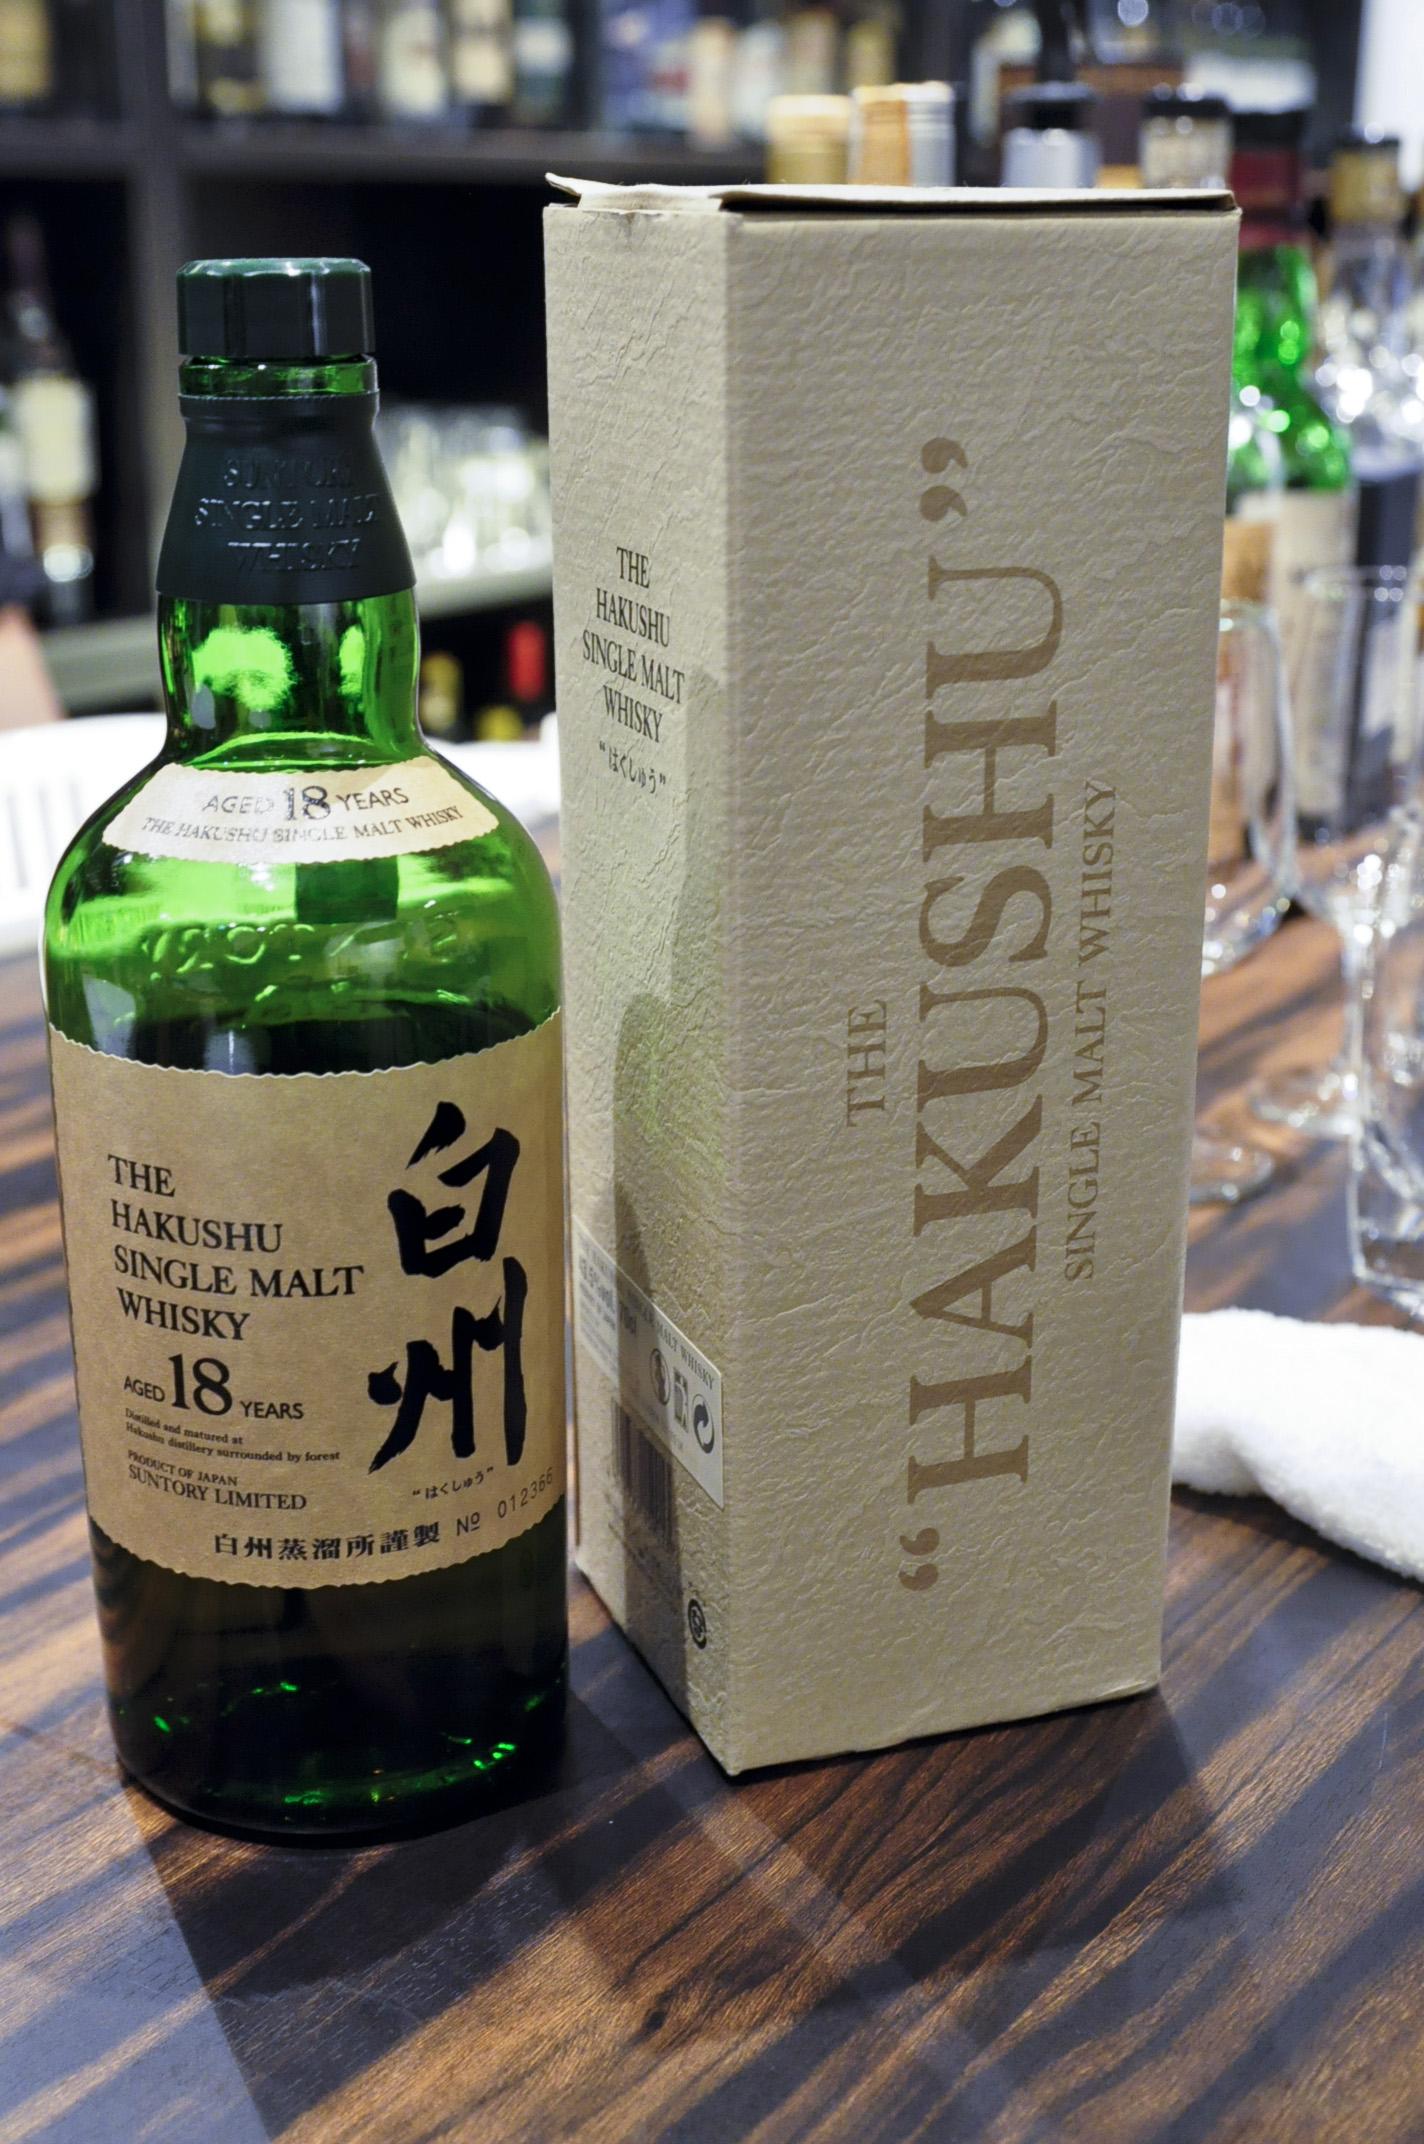 "【BL/SC】白州 Hakusyu 18yo (43.5%, OB) 欧州向け ""imported by morrison bowmore"" 表記"